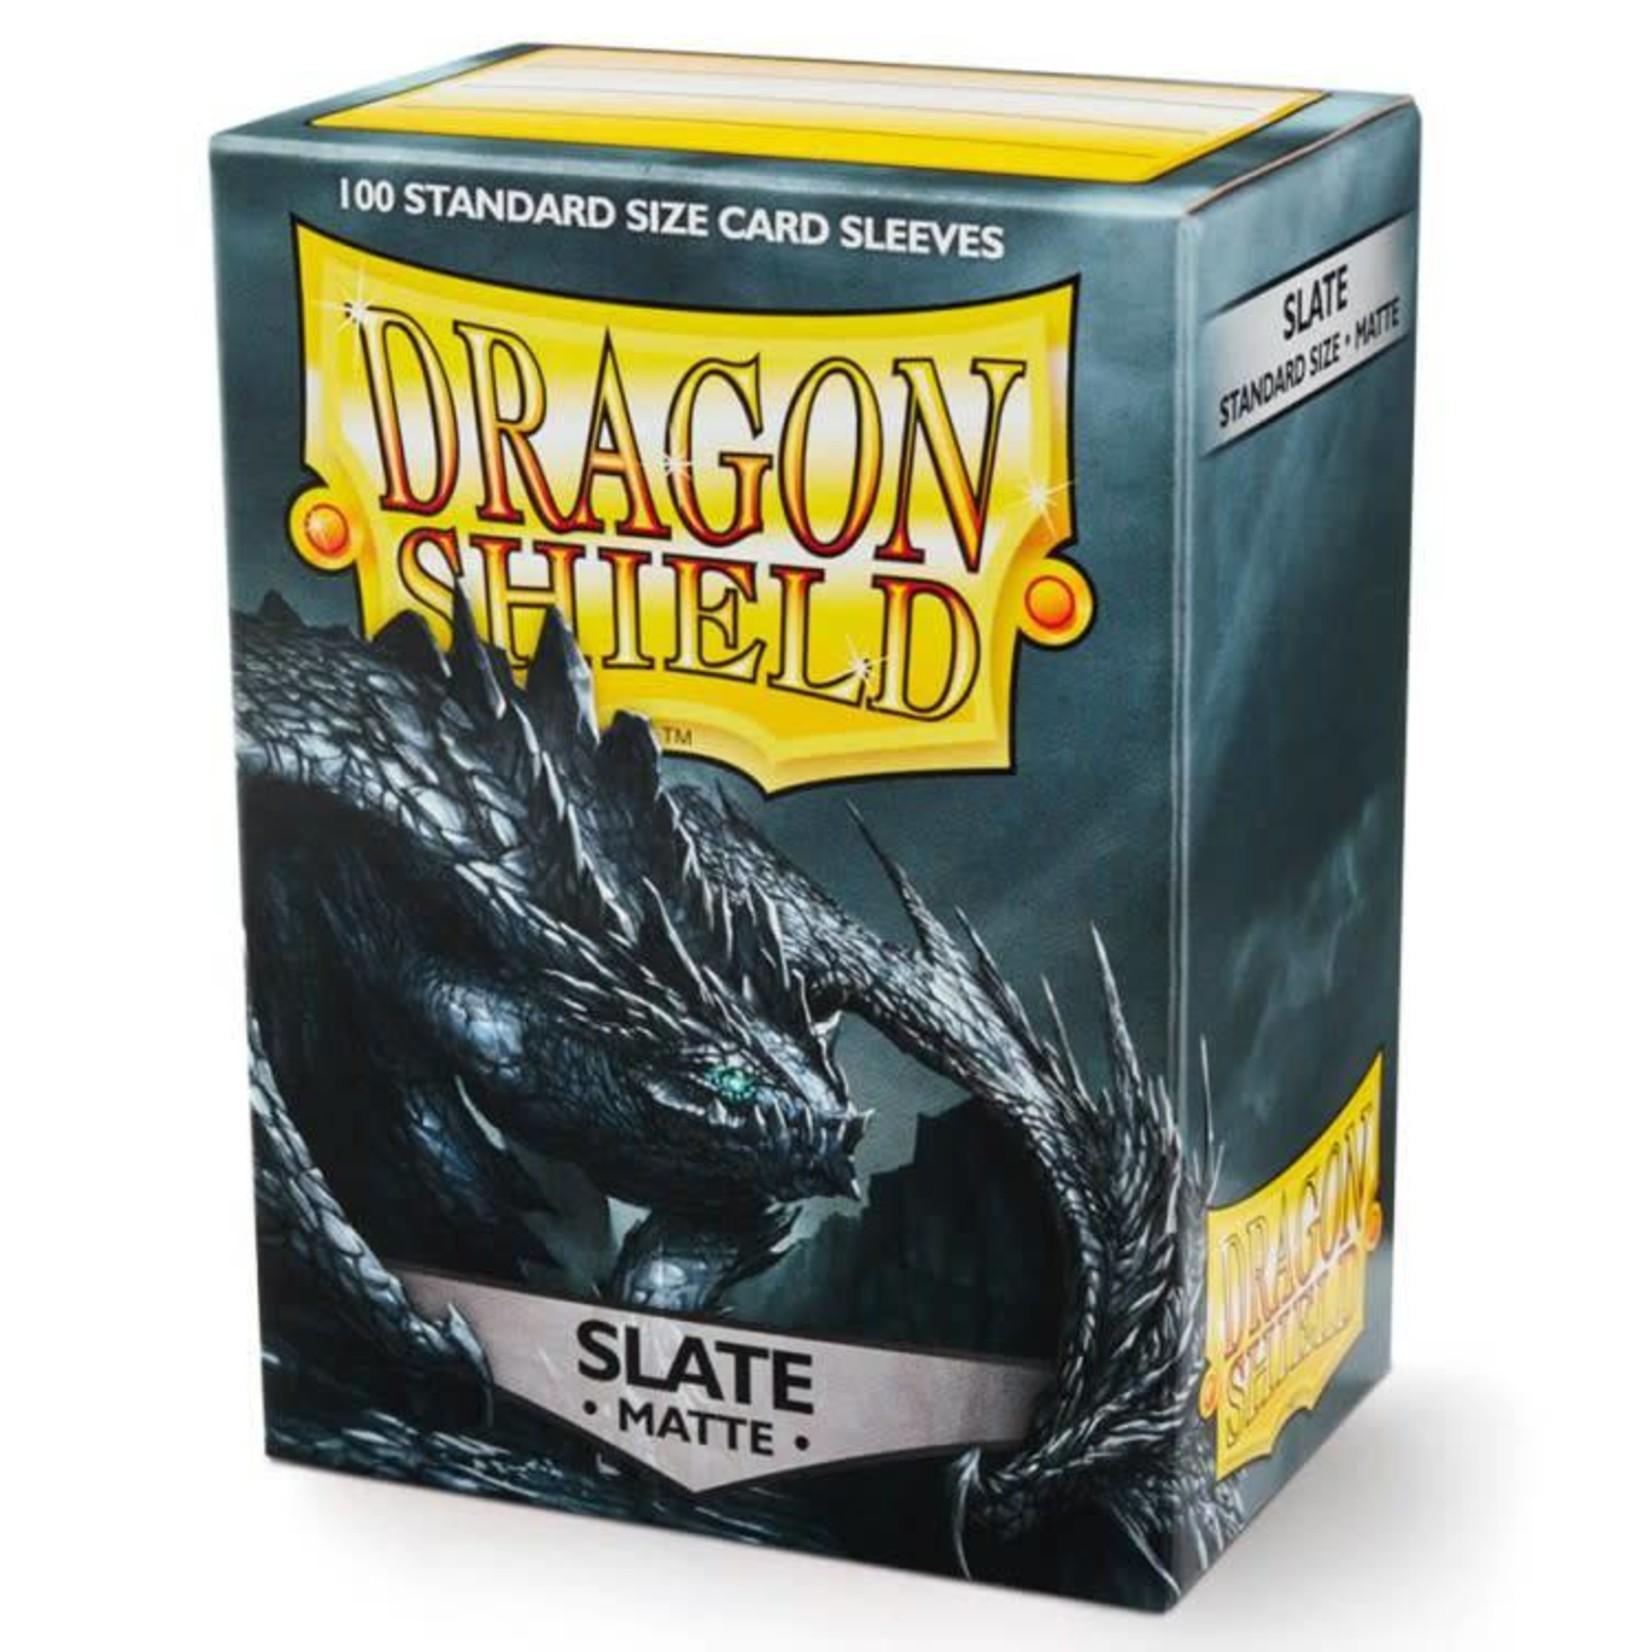 Arcane Tinman Dragon Shield: Card Sleeves - Matte Slate (100)